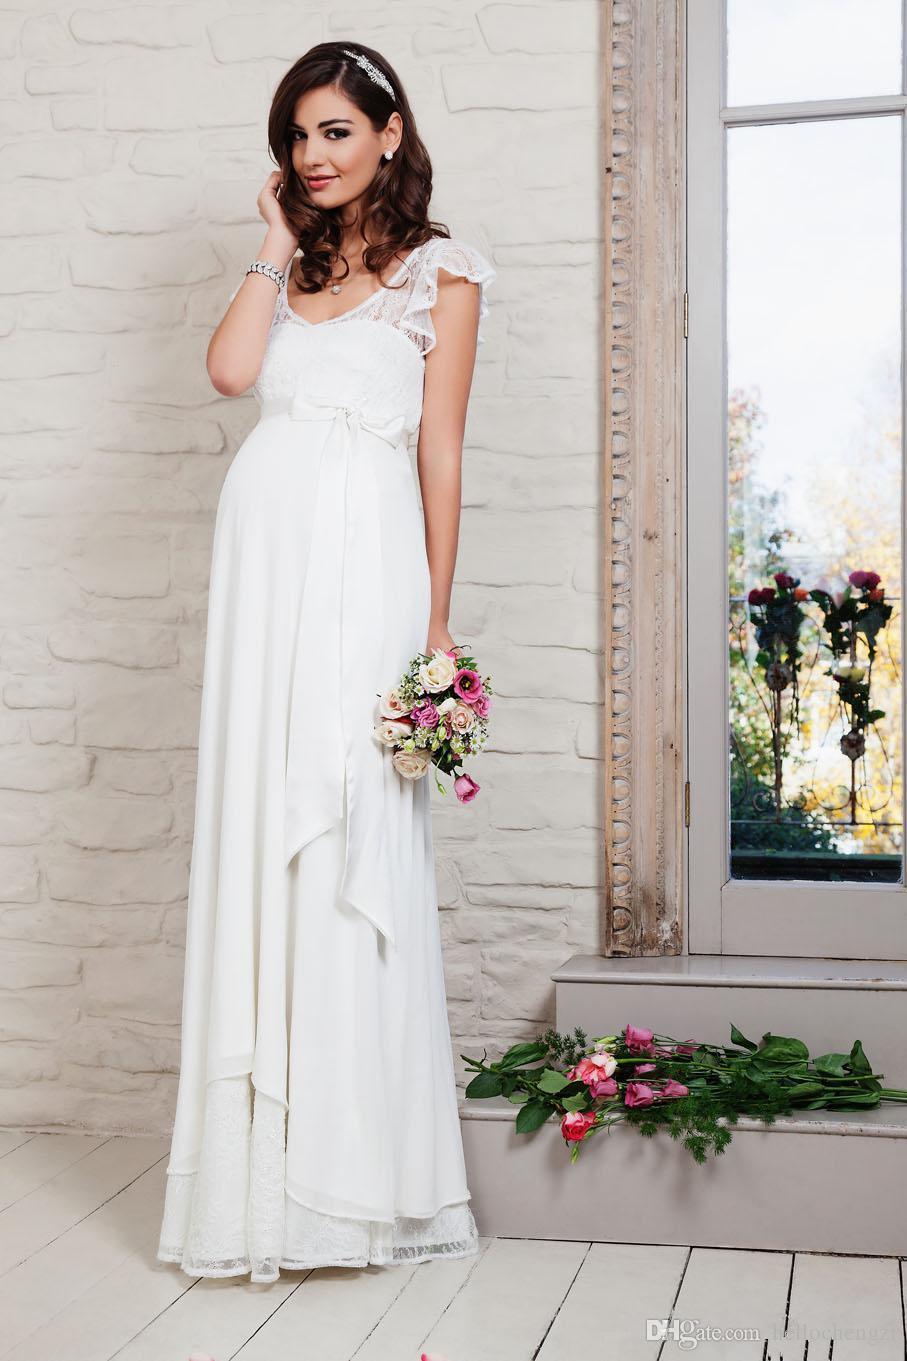 classy maternity bridesmaid dresses pregnancy wedding dresses Wedding Dresses Maternity Maternity Wedding Dresses